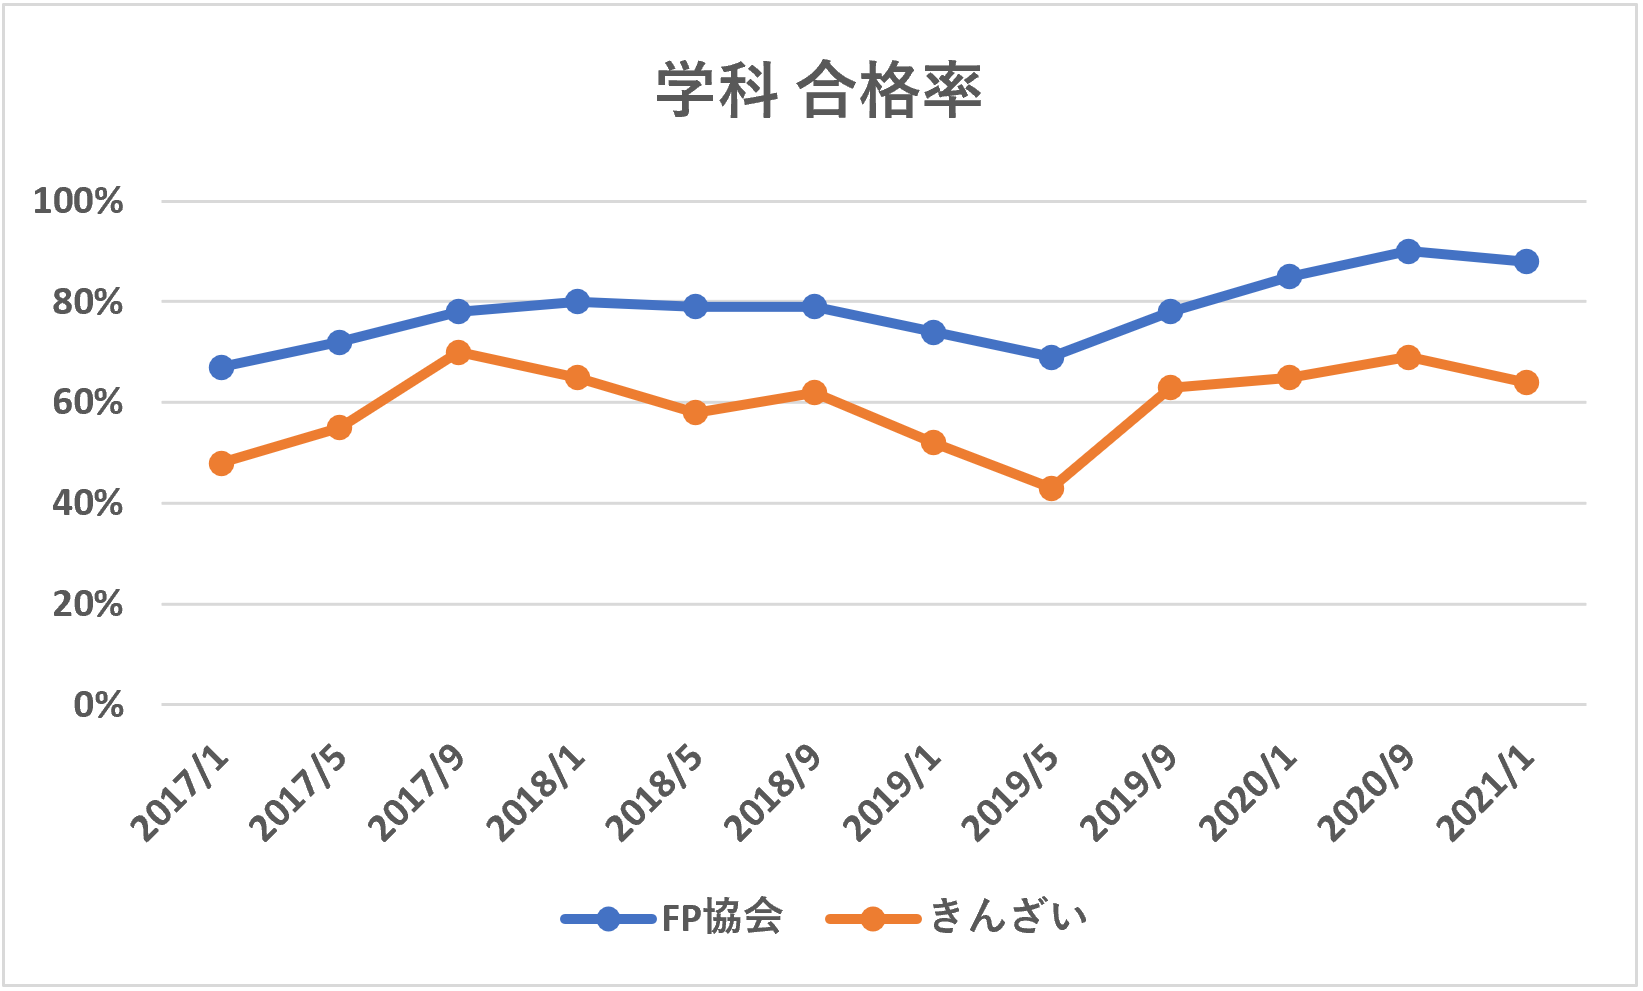 FP3級学科合格率推移